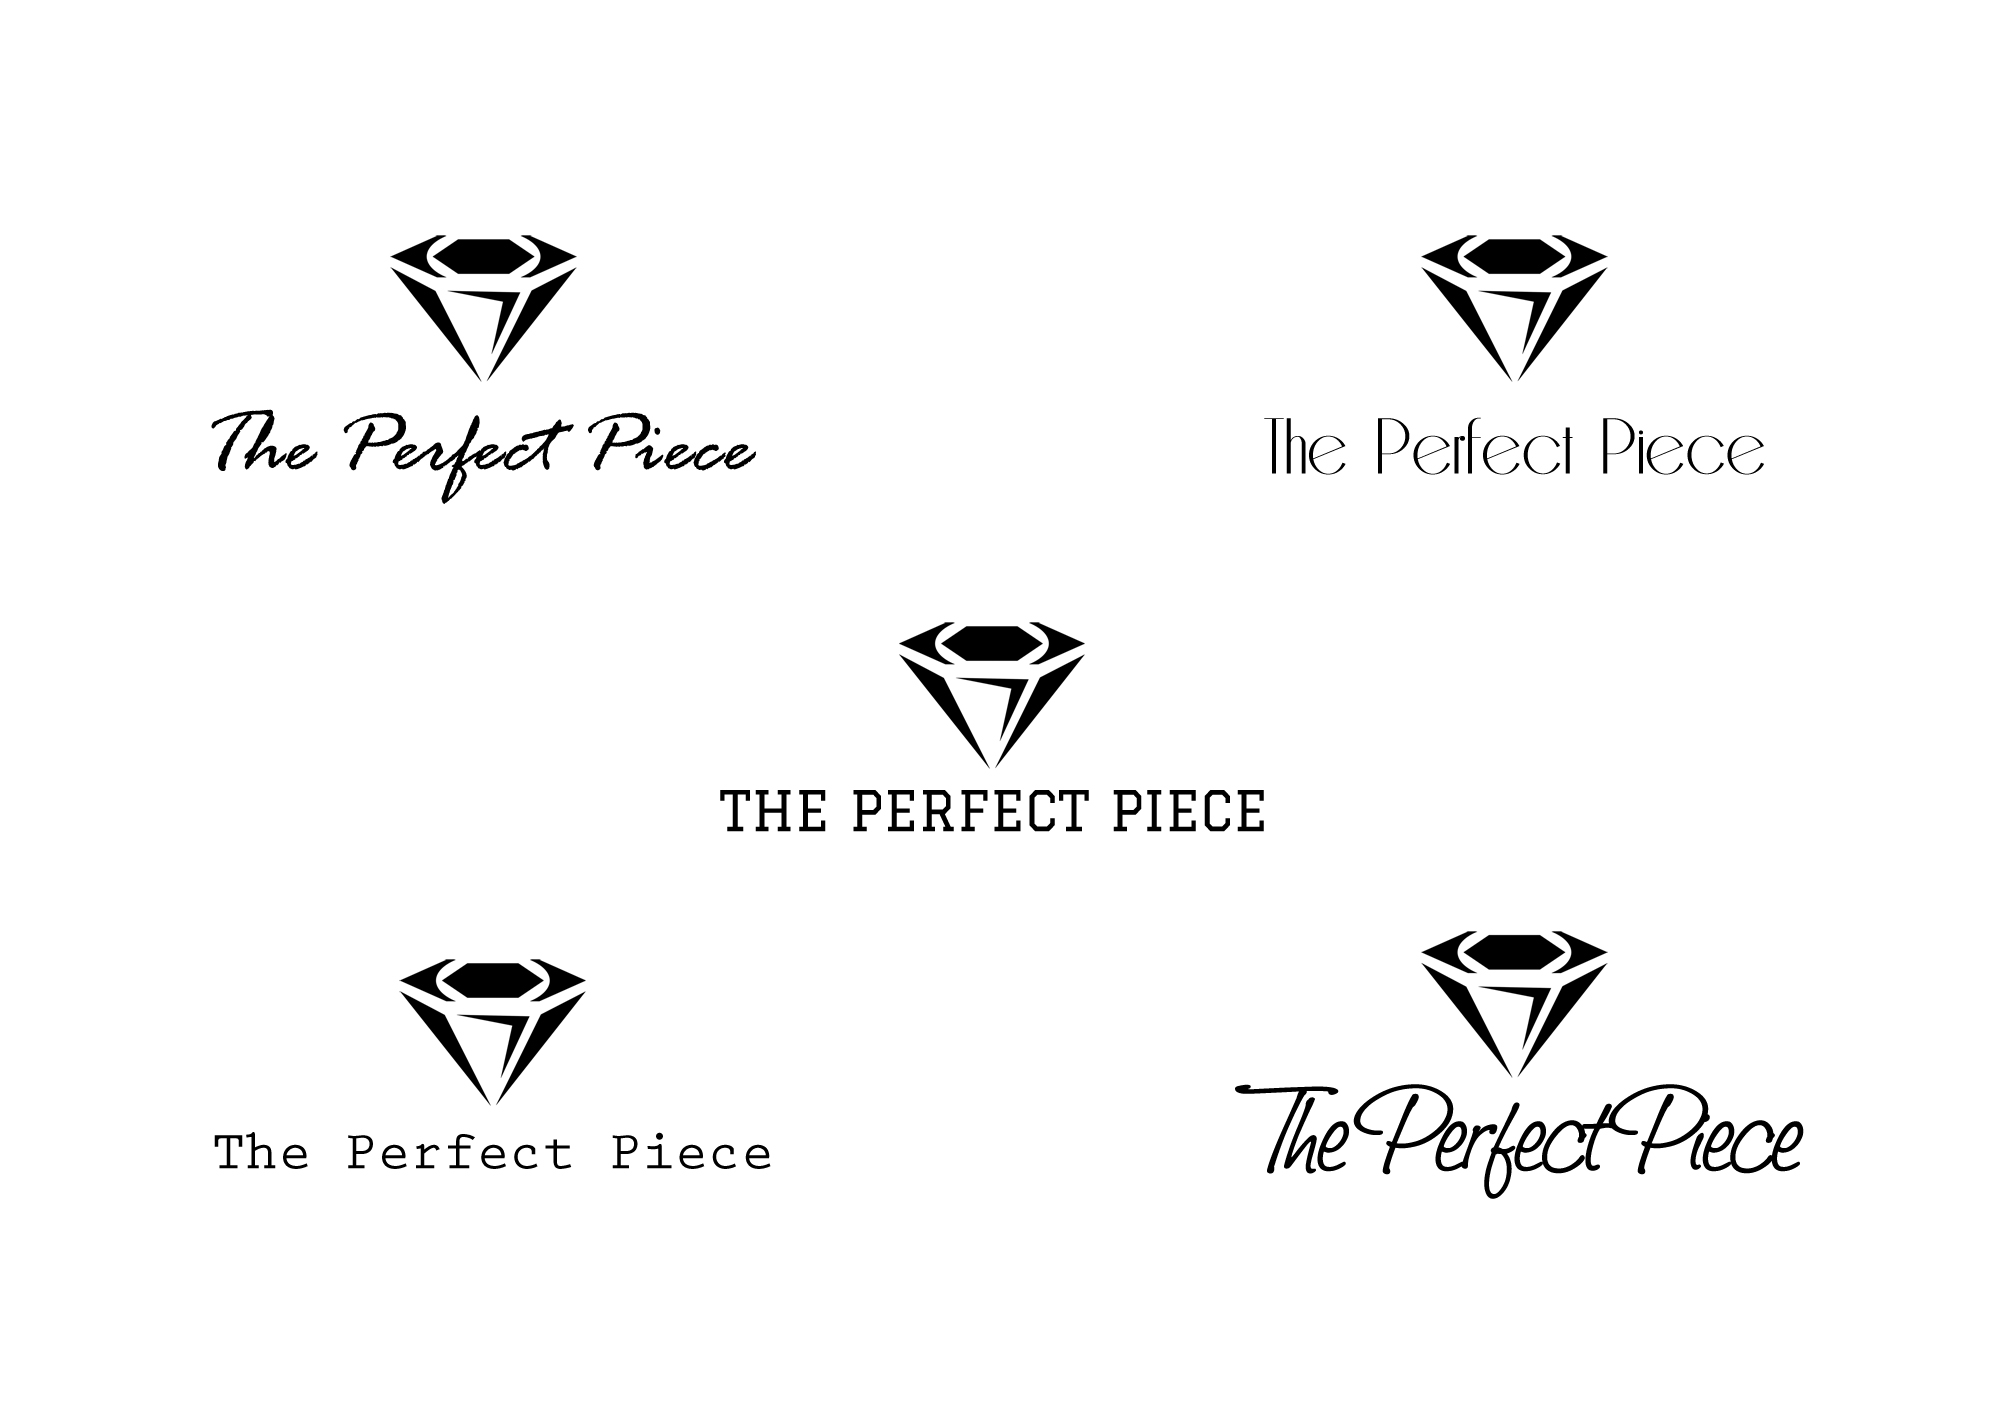 Logo Design by Brix Estanilla - Entry No. 29 in the Logo Design Contest Unique Logo Design Wanted for The Perfect Piece.